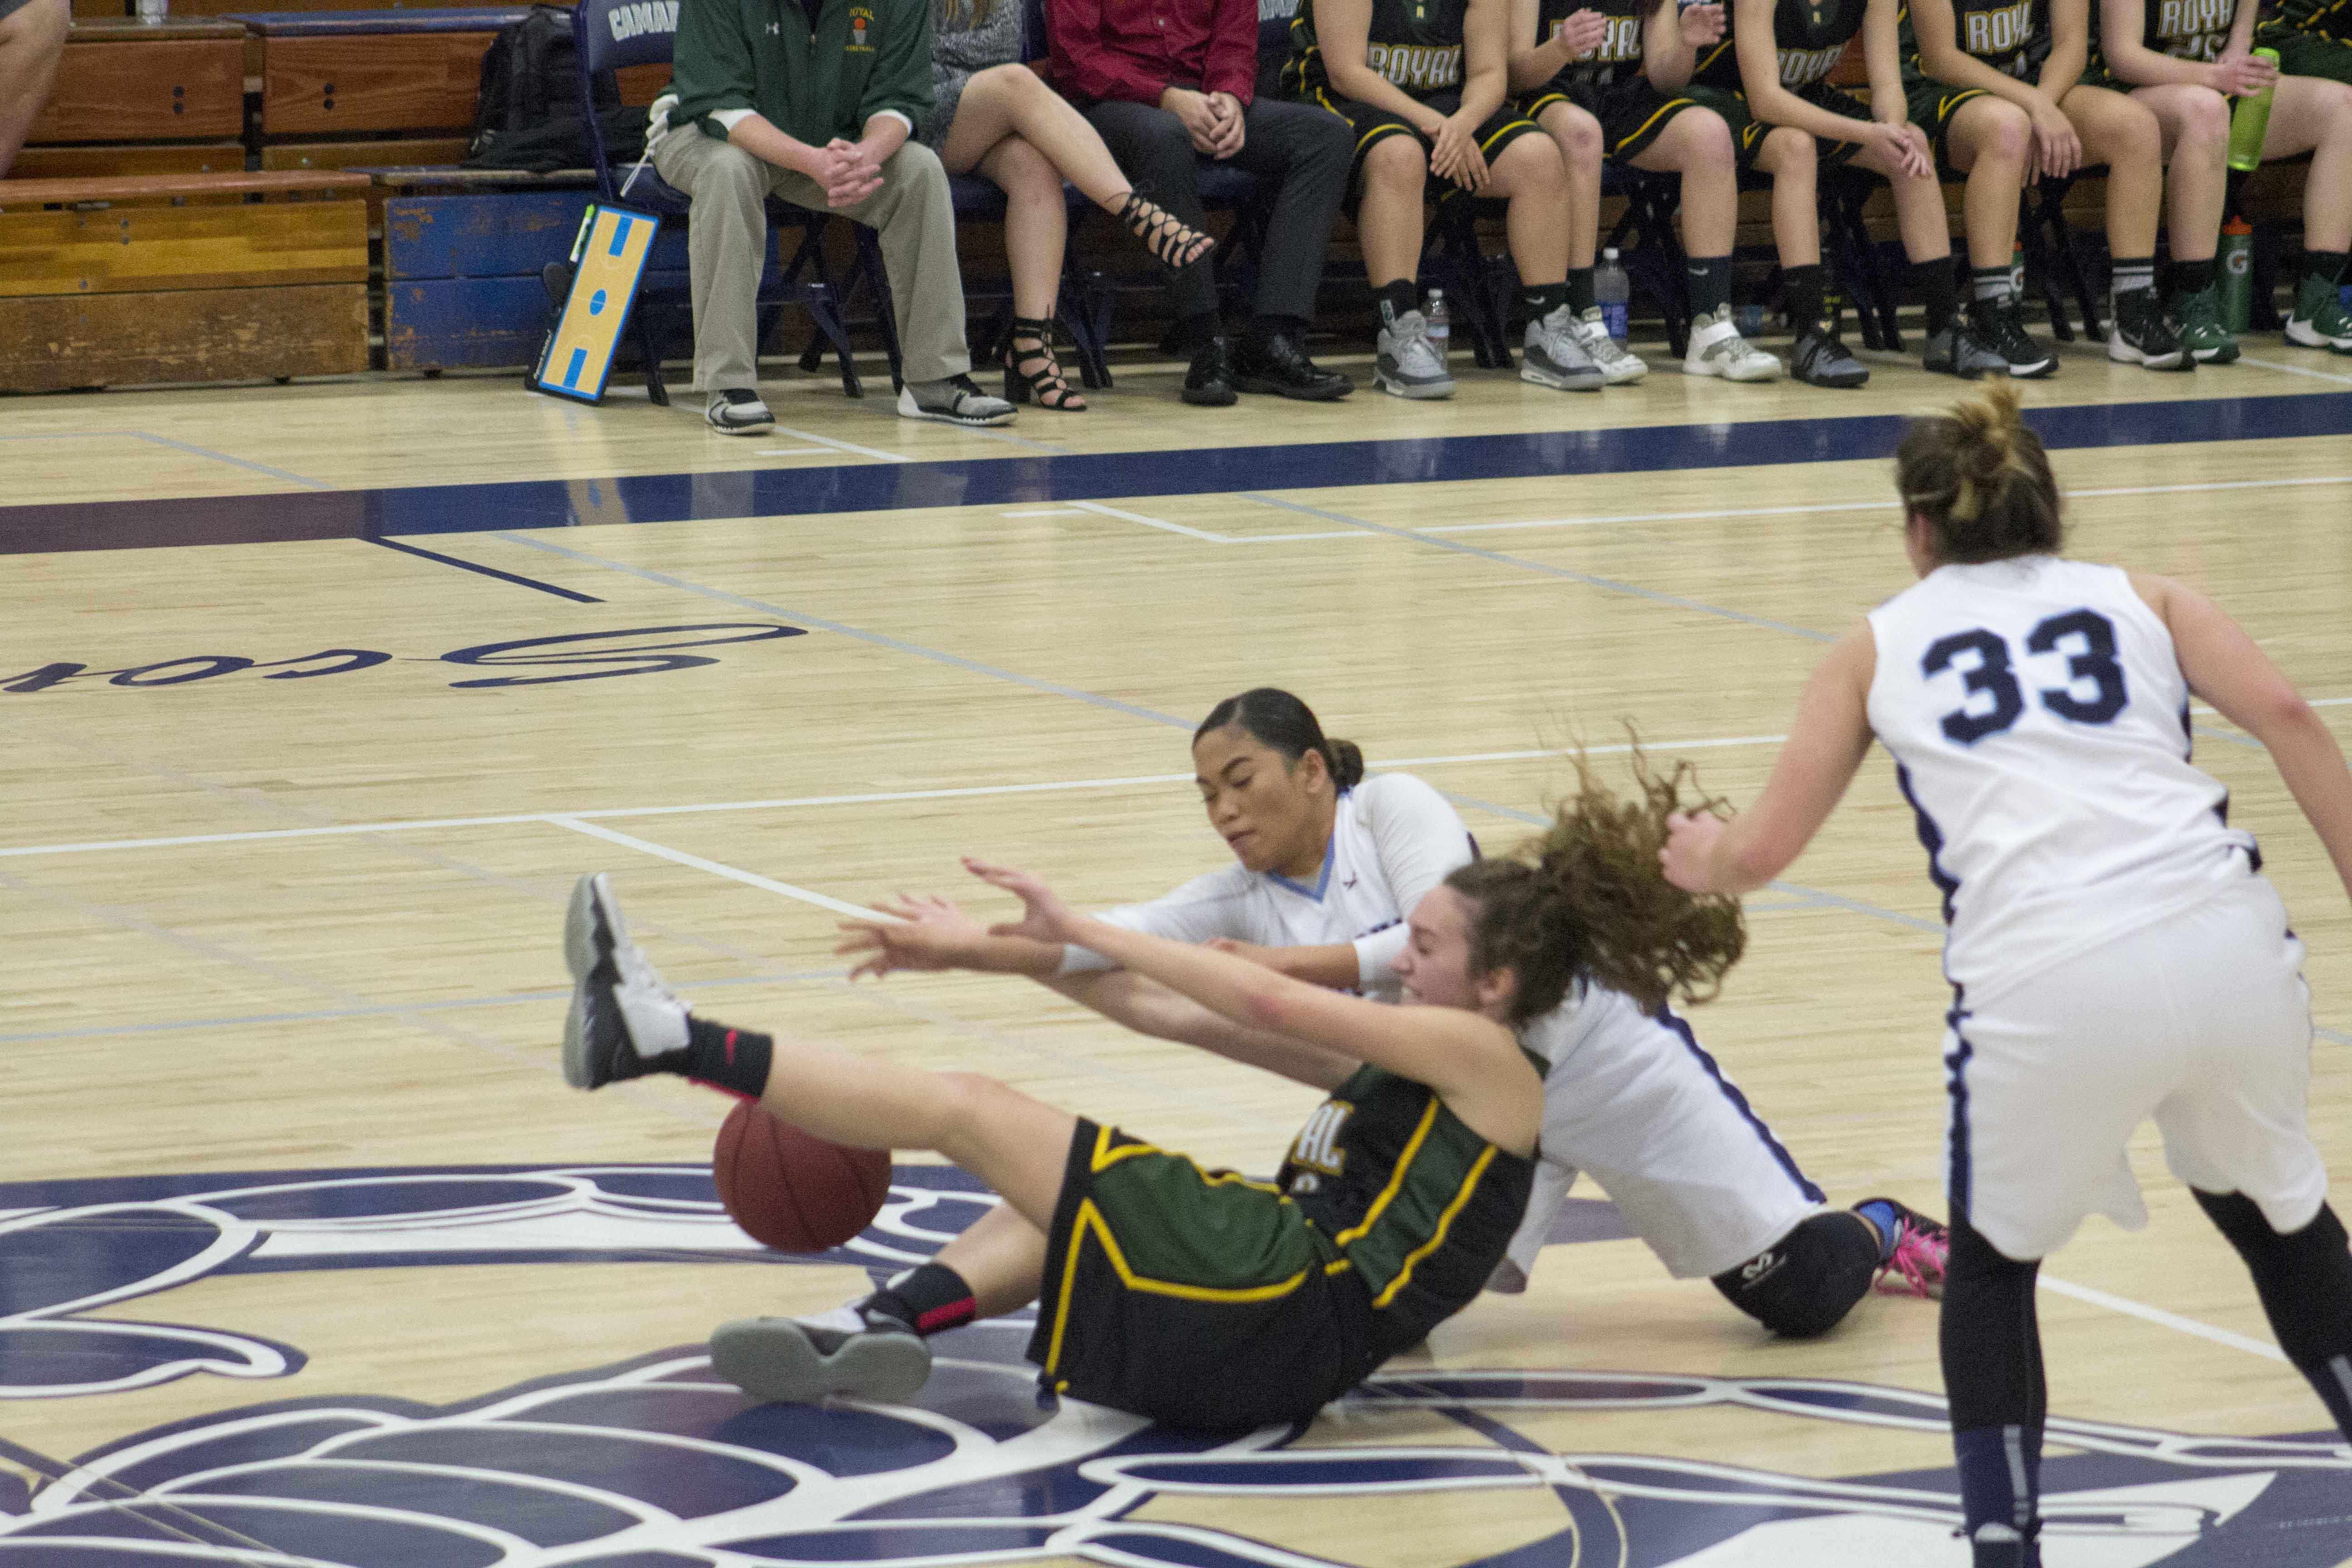 Nikki Puga, senior, dives for the loose ball.